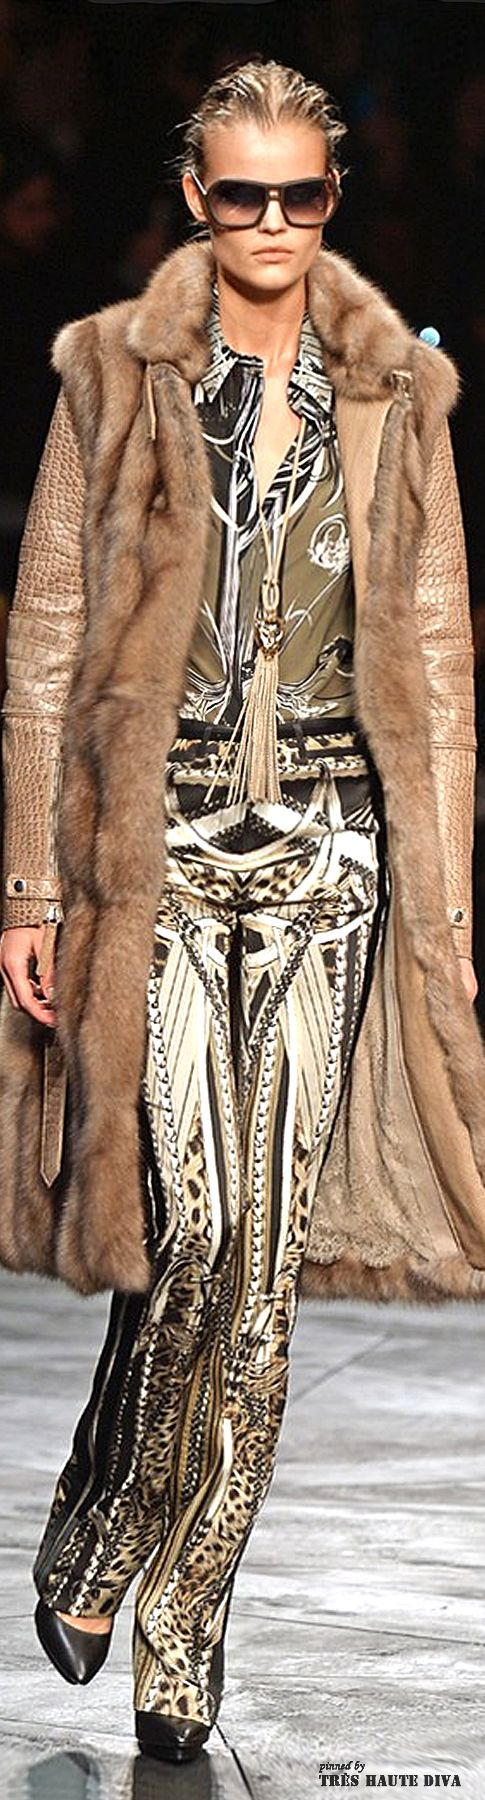 #Milan Fashion Week Roberto Cavalli Fall/Winter 2014 RTW